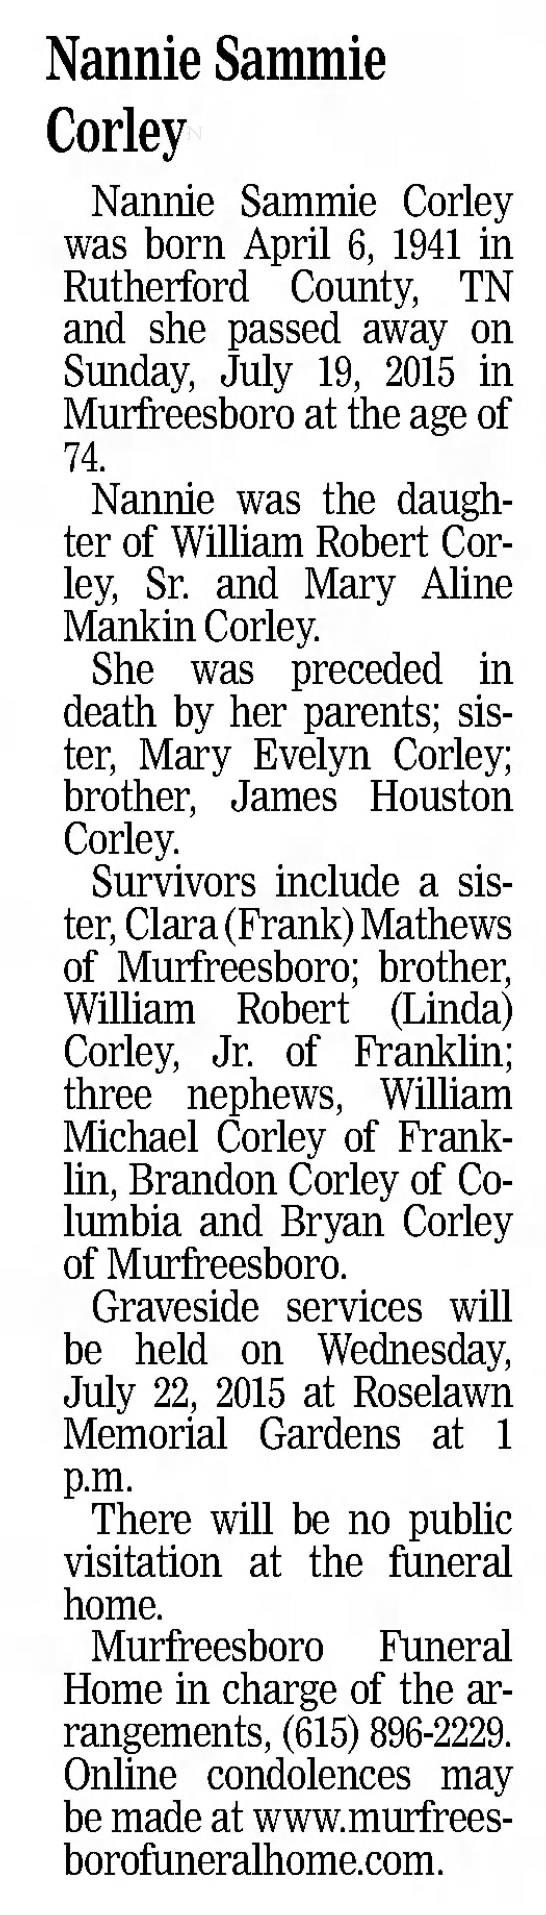 Nannie Sammie Corley obituary